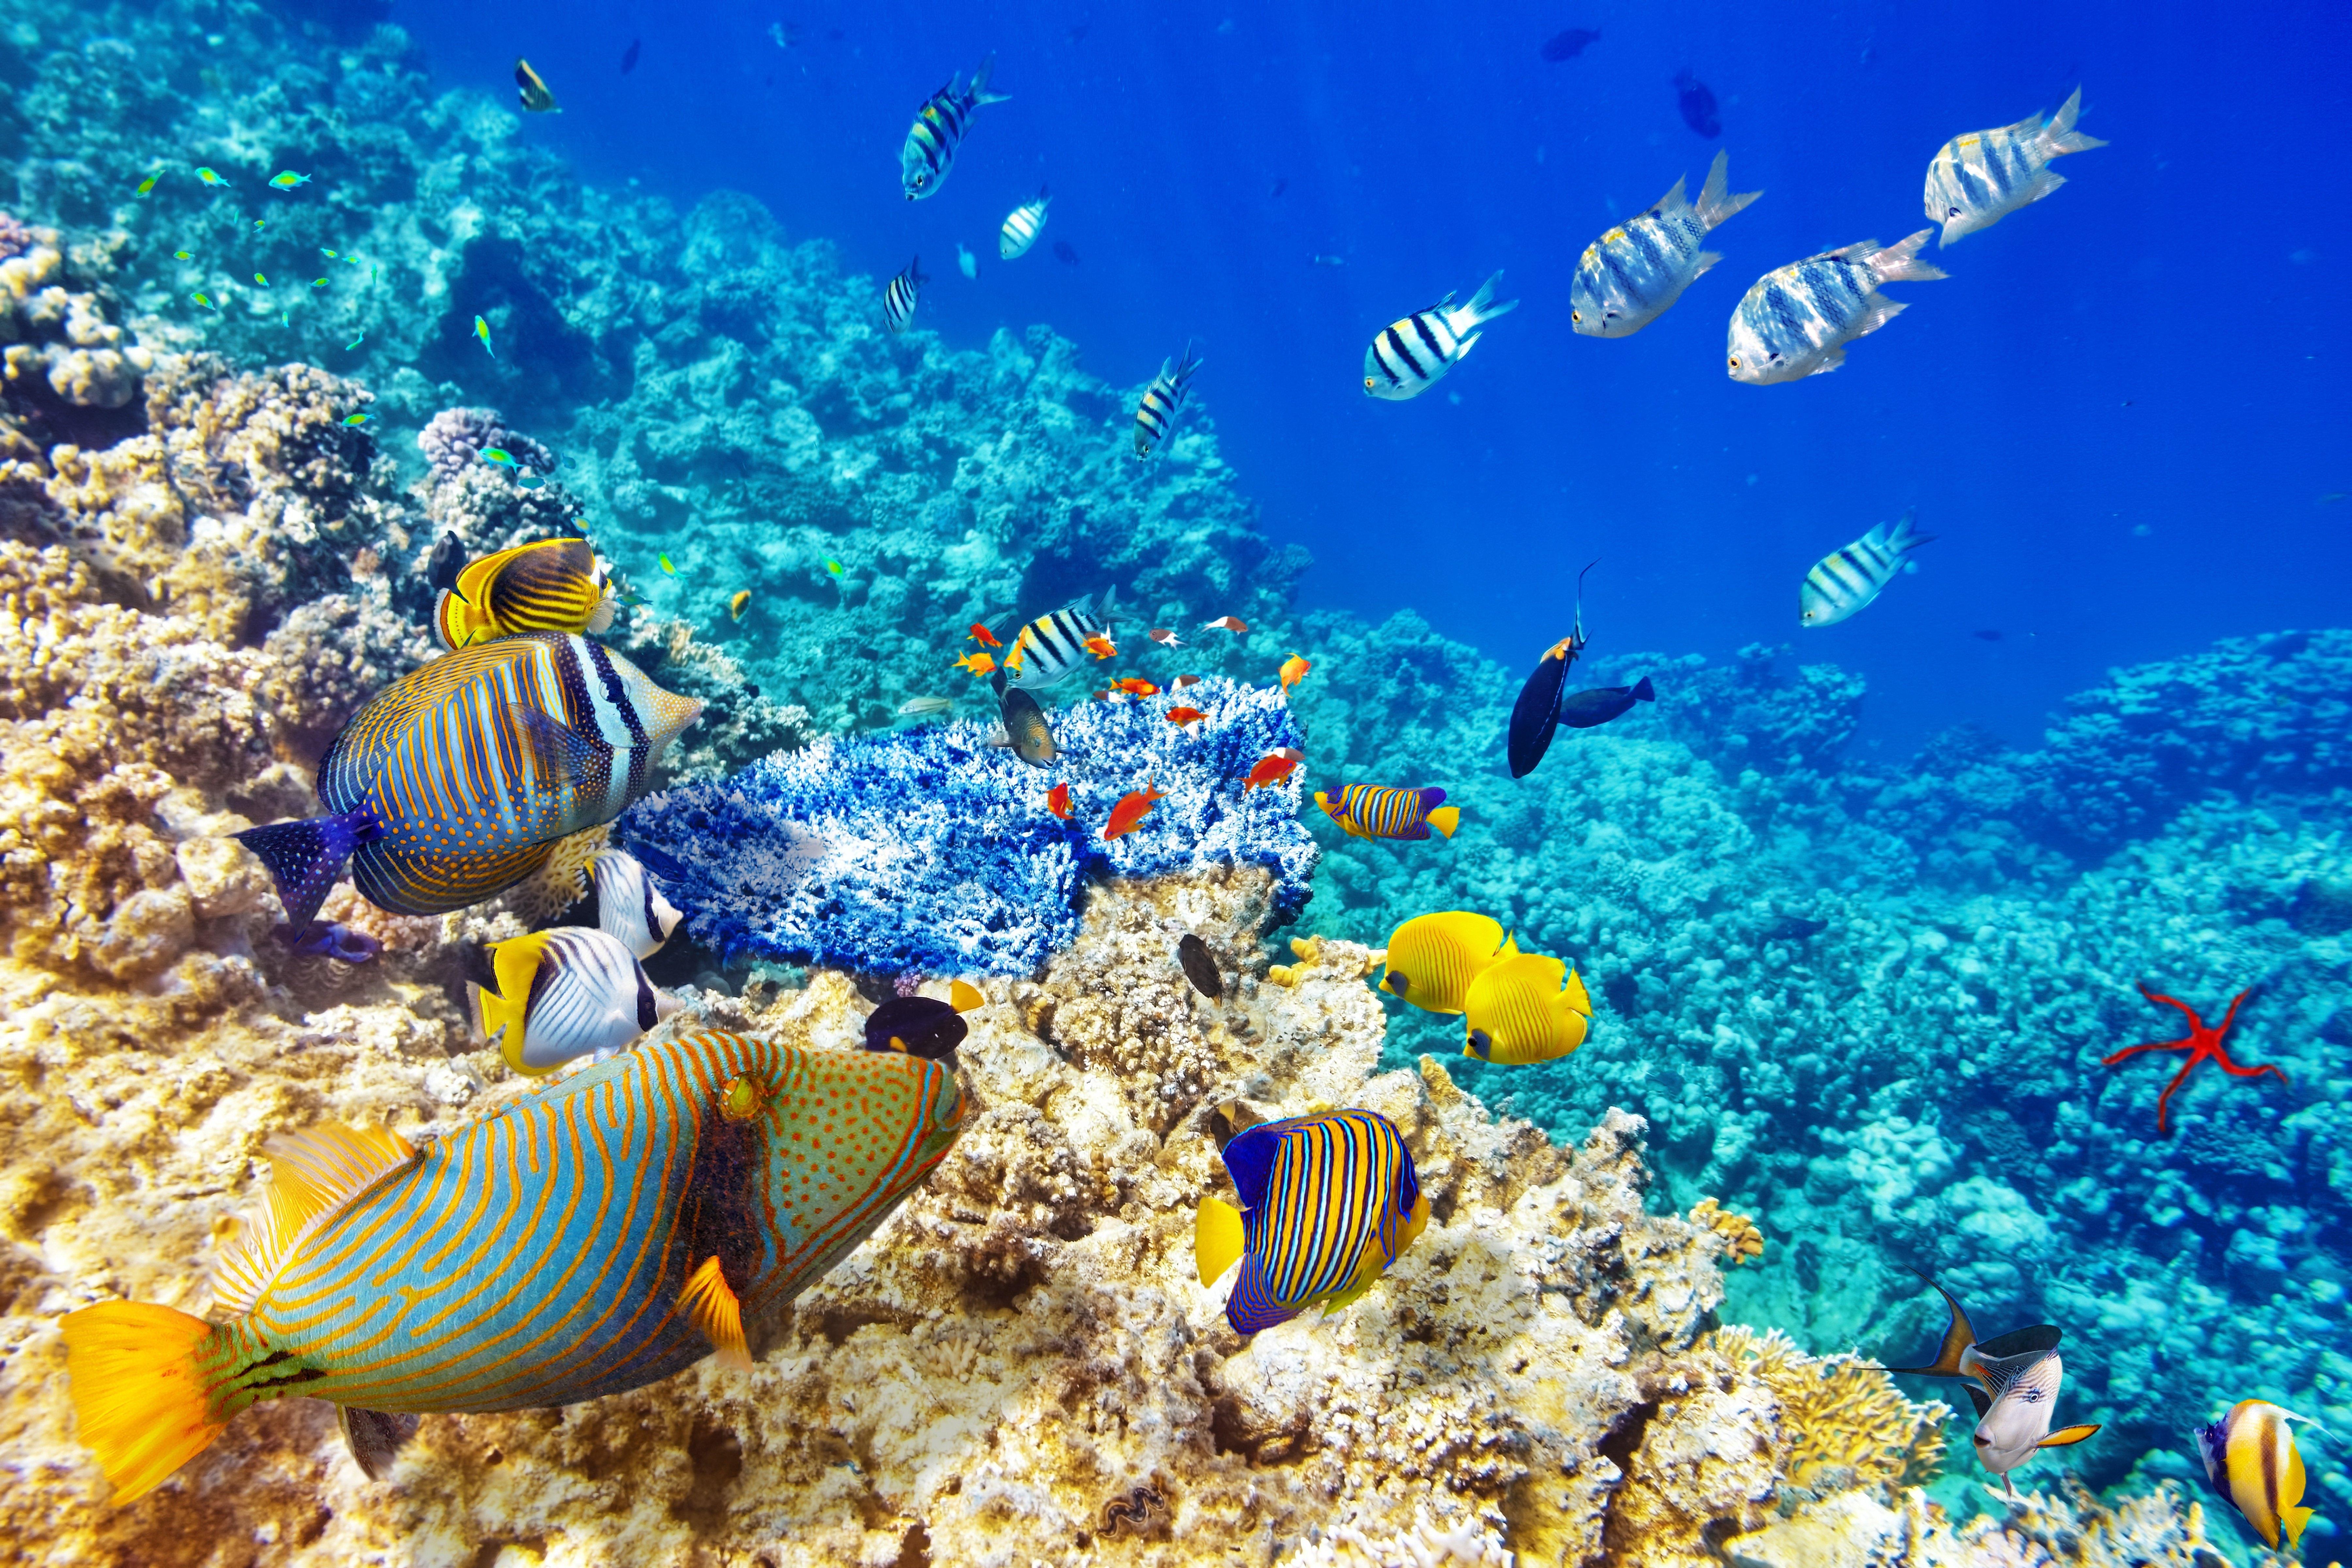 Coral Reef Wallpaper Hd - 3840x2400 - Download HD ...